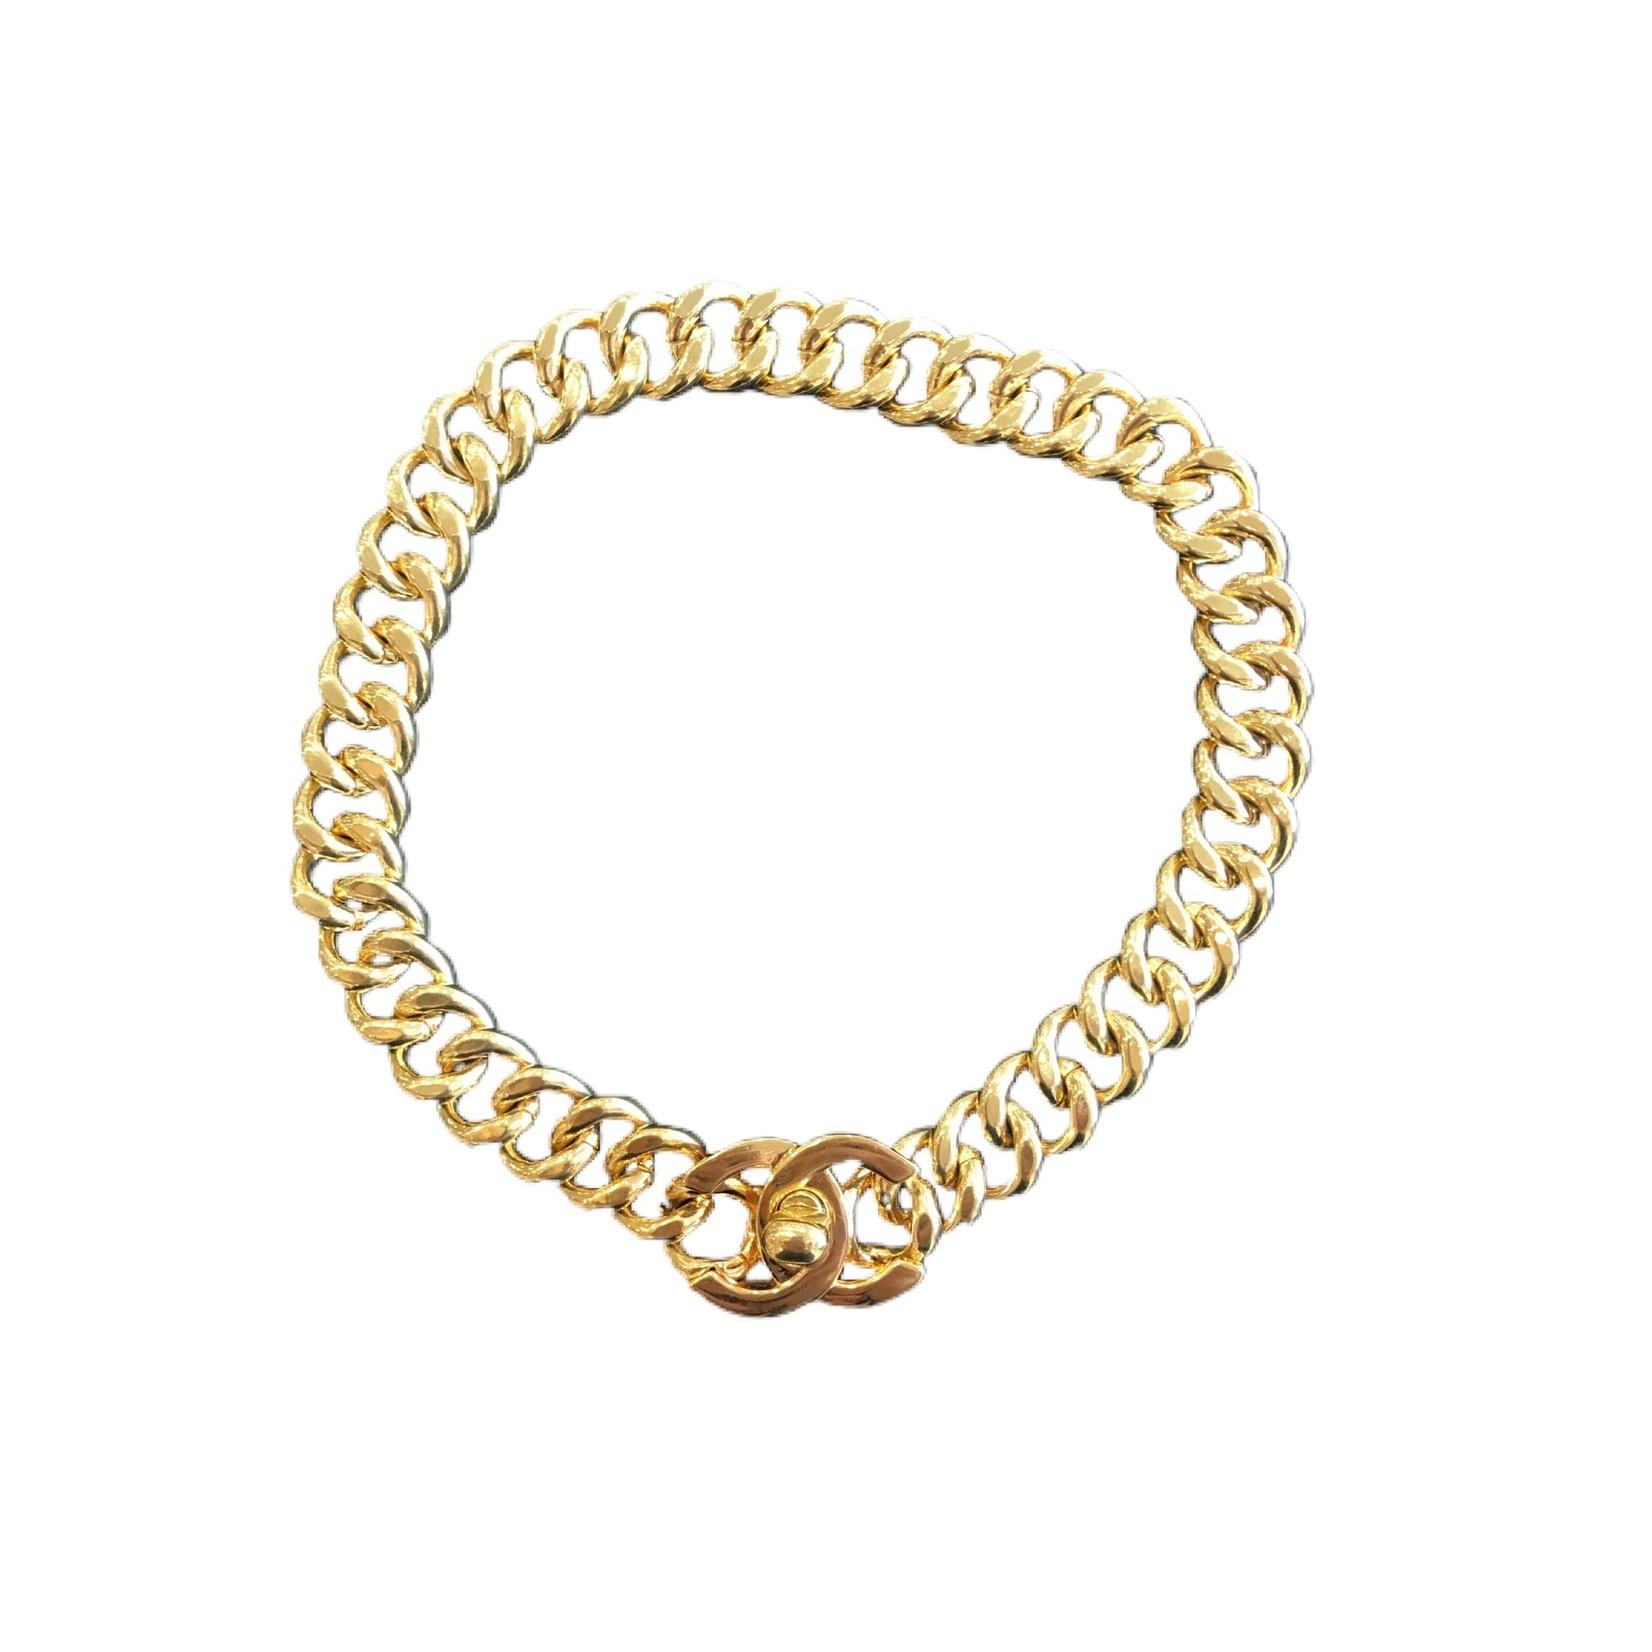 Wyld Blue Vintage 1995 Chanel Vintage Turnlock CC Choker Necklace 24k Gold Plated